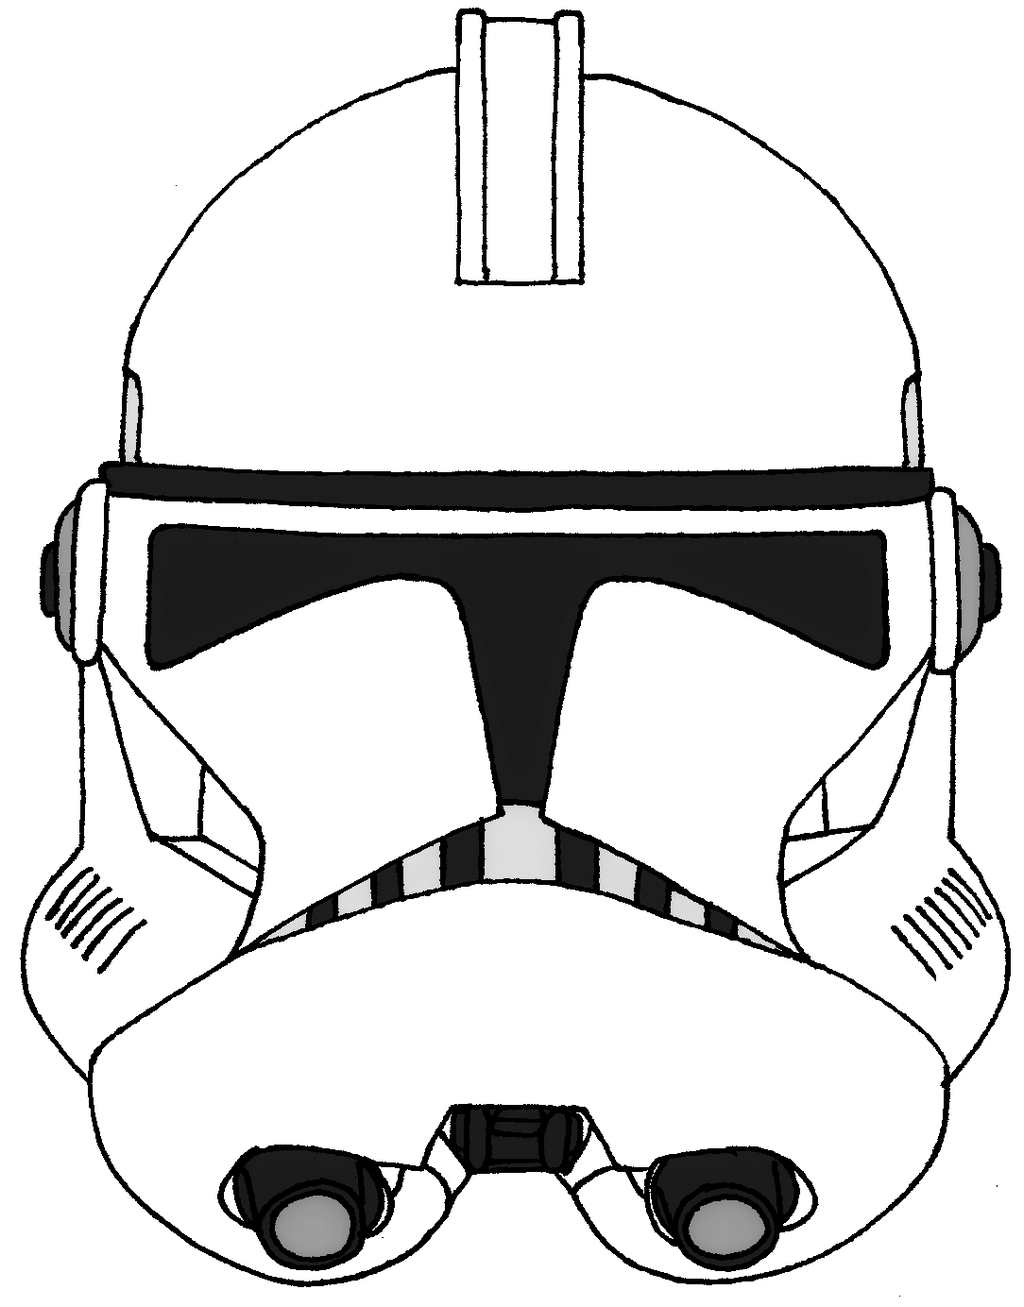 Stunning Stormtrooper helmet coloring sheet